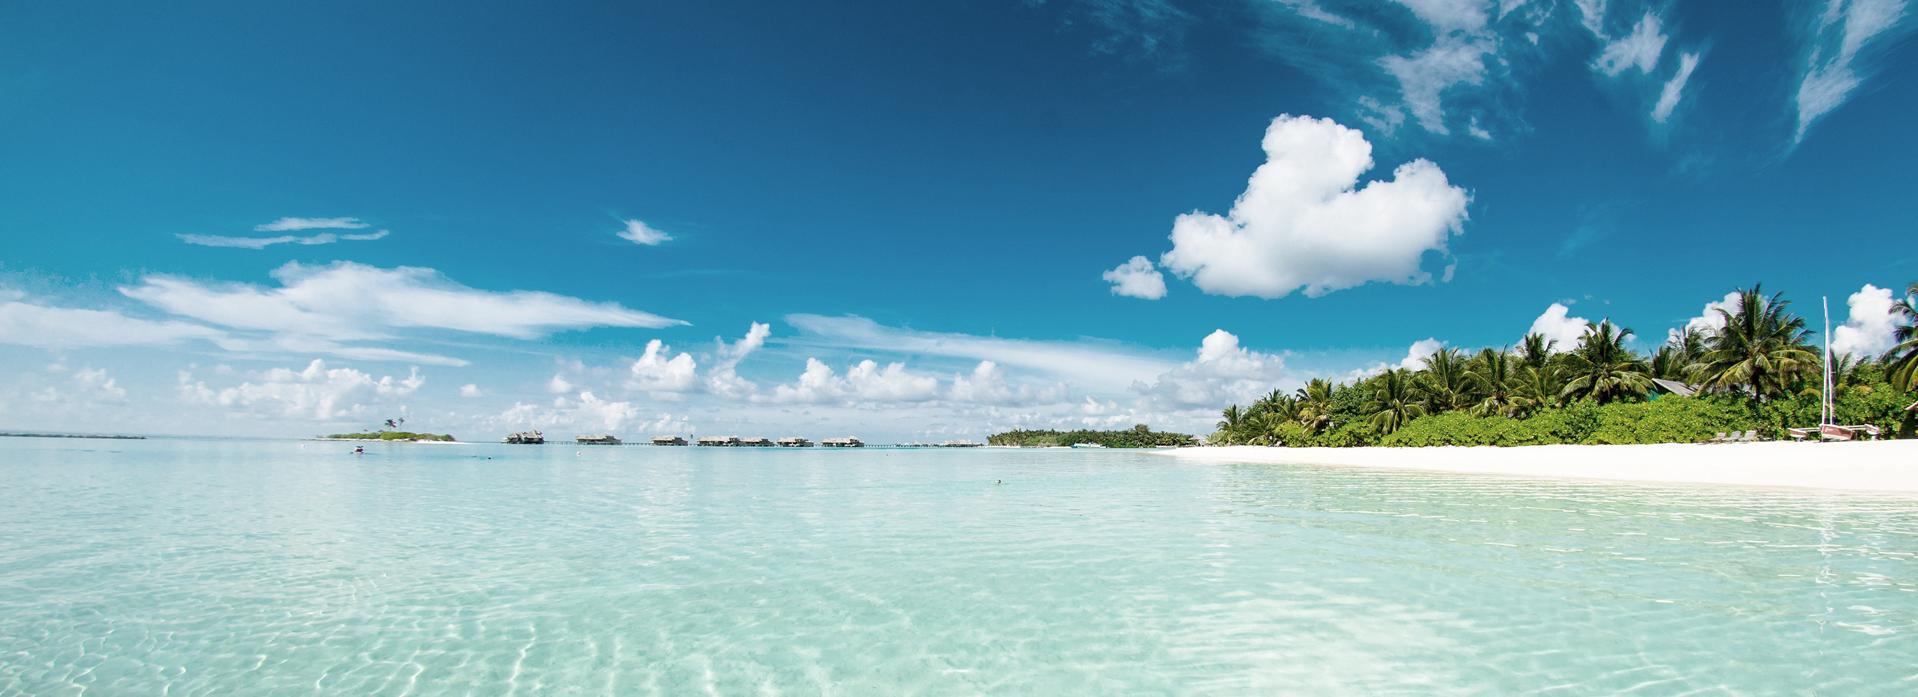 TopDestinationsFor2020-Maldives-CreditAsadPhoto